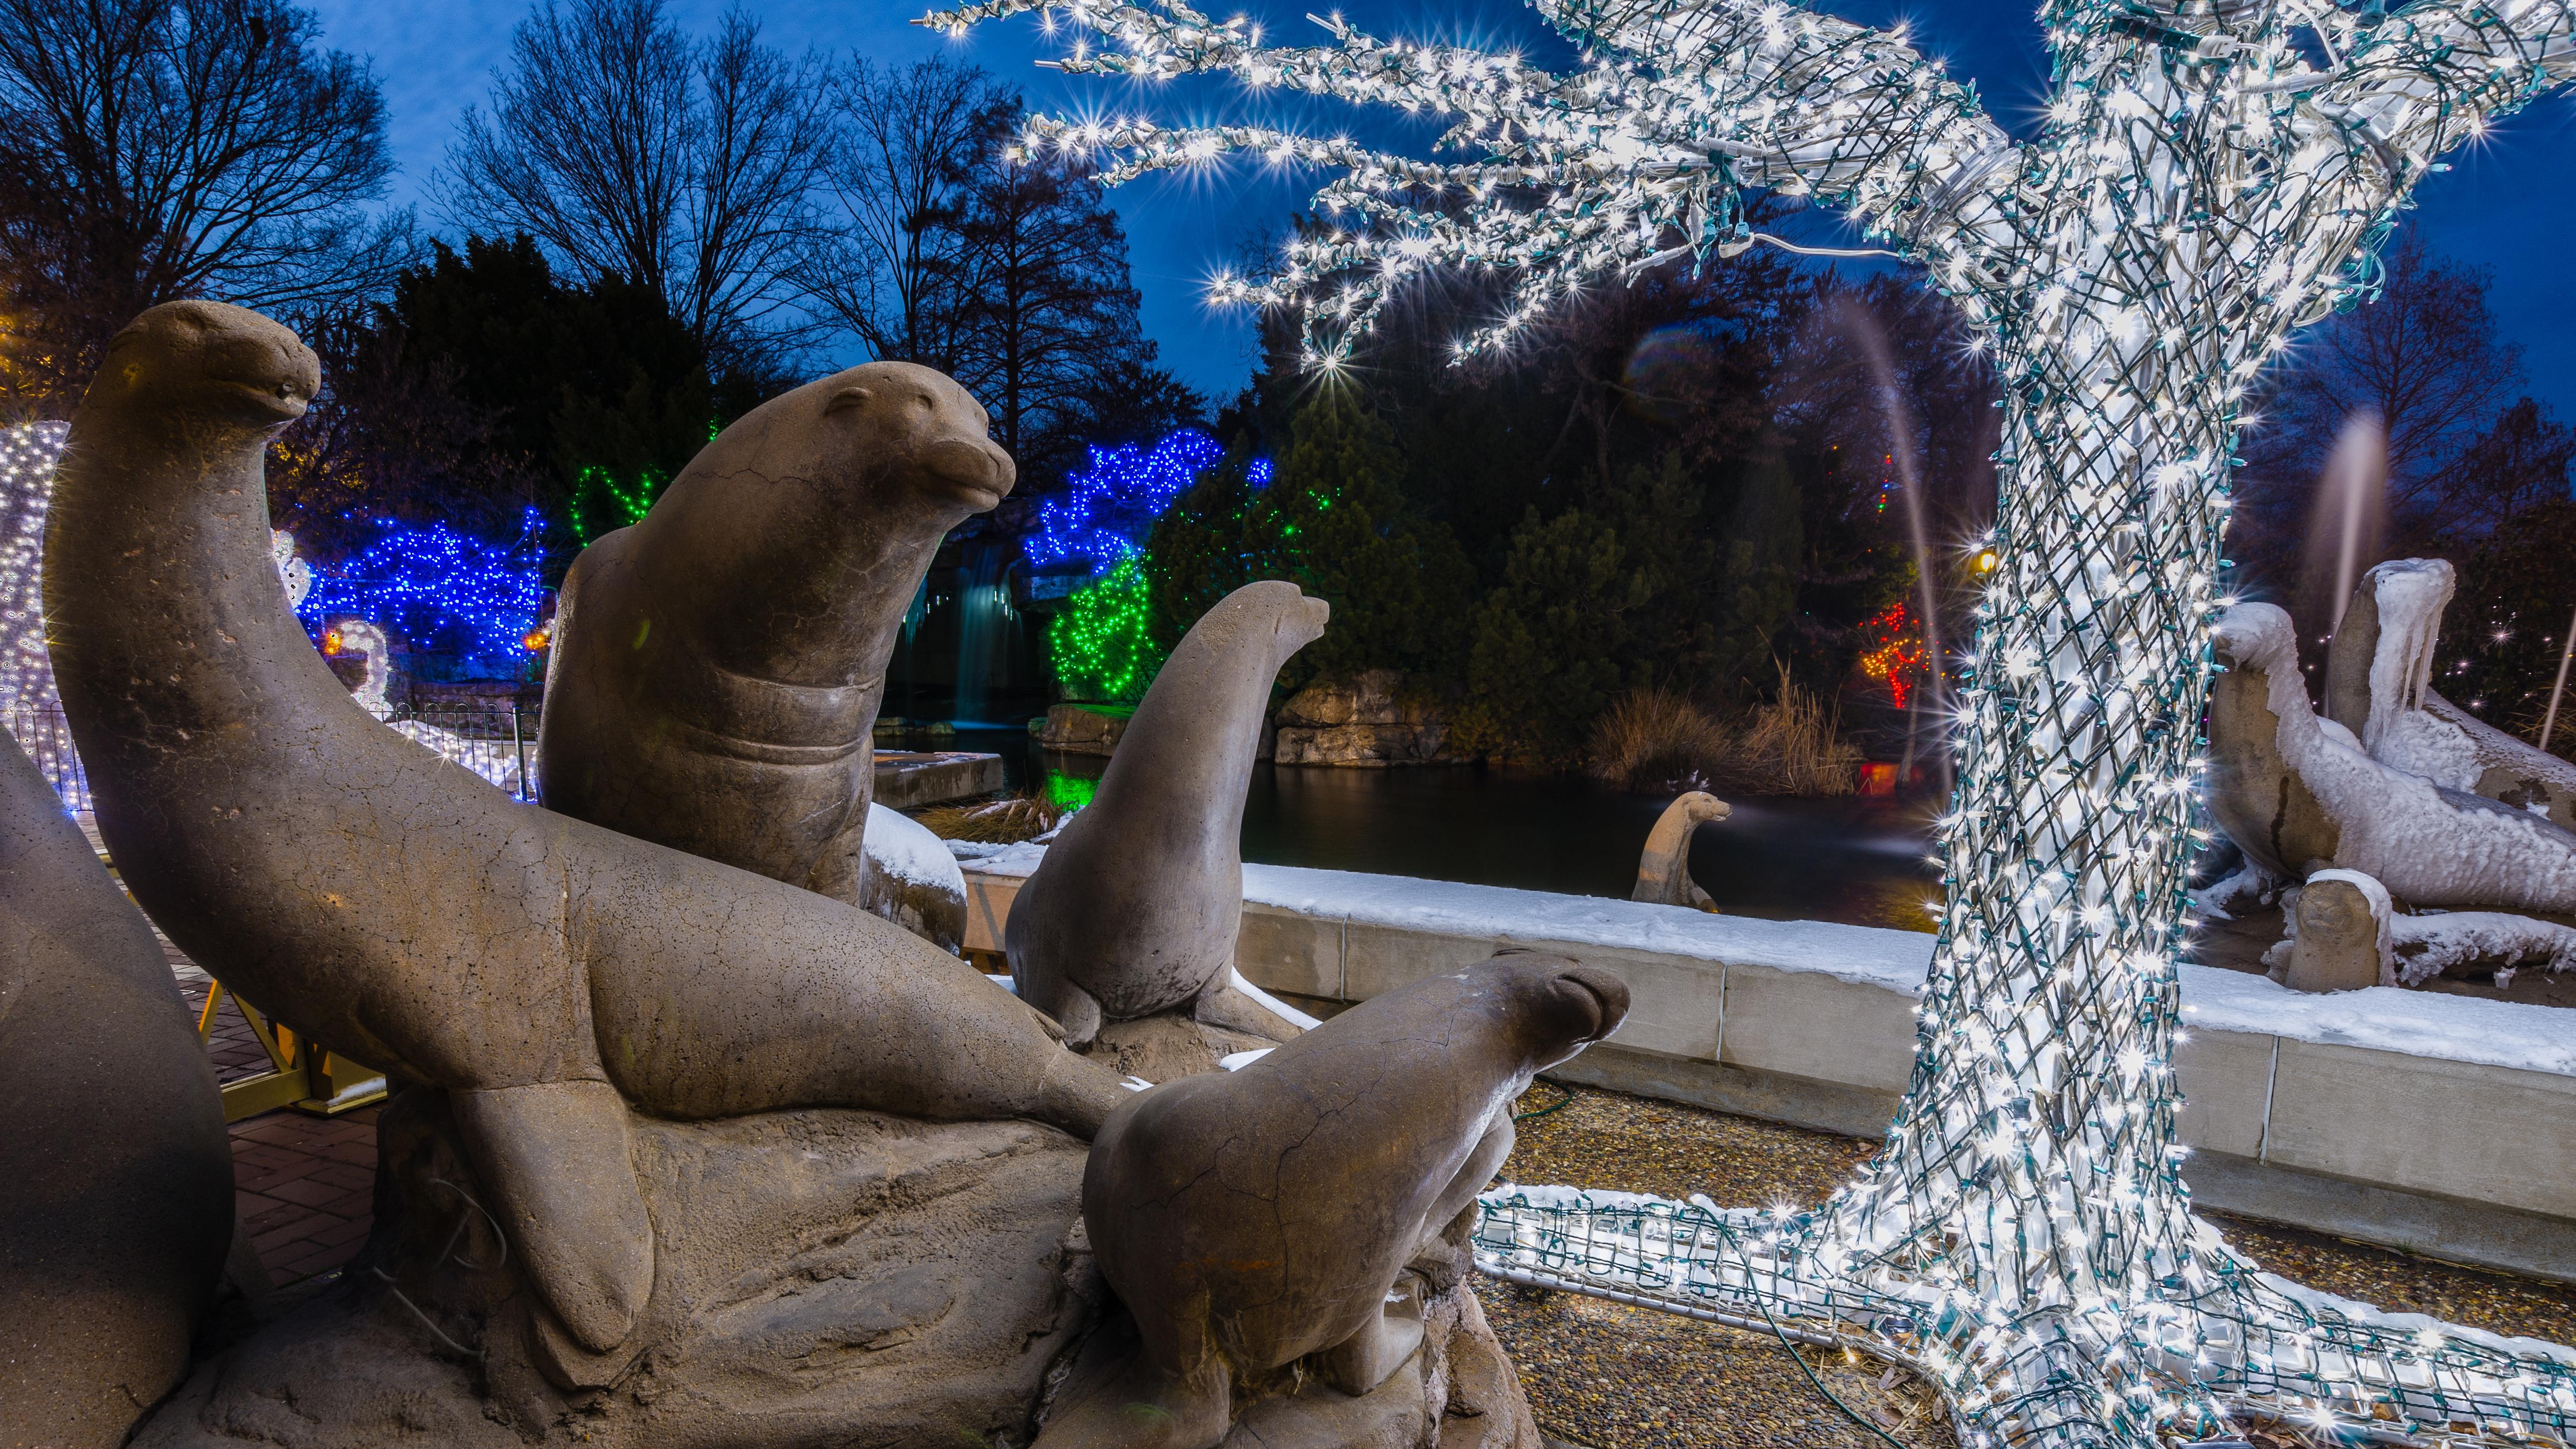 Lion Around The Tree, Animal, Christmas, Lights, Missouri, HQ Photo